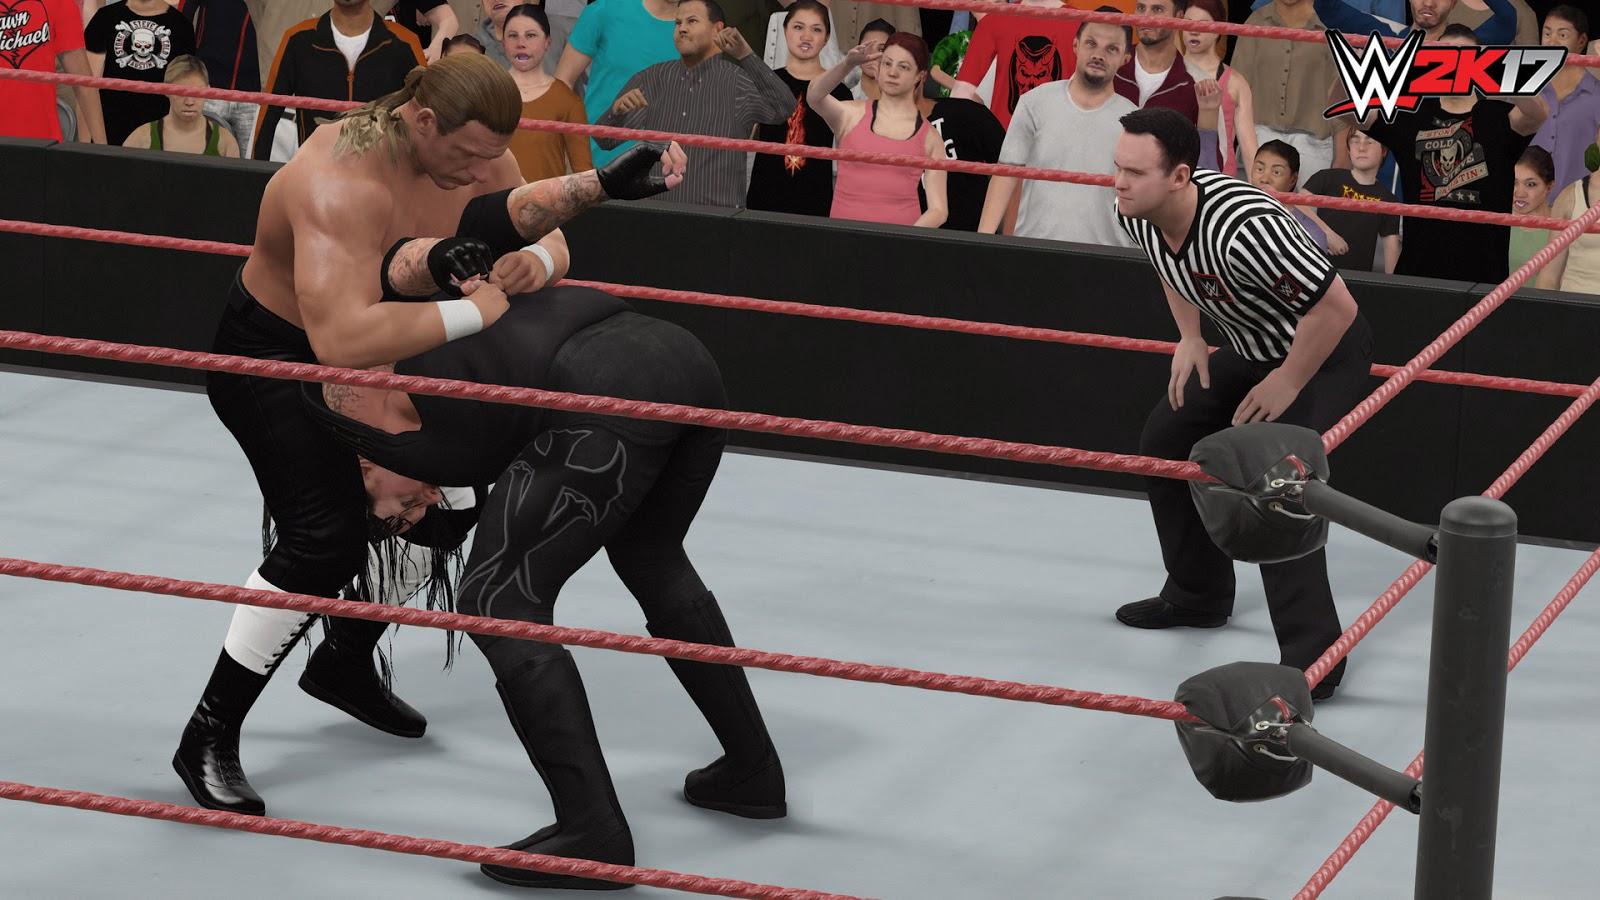 WWE 2K17 ESPAÑOL PC Descargar Full (CODEX) + REPACK 10 DVD5 (JPW) 3